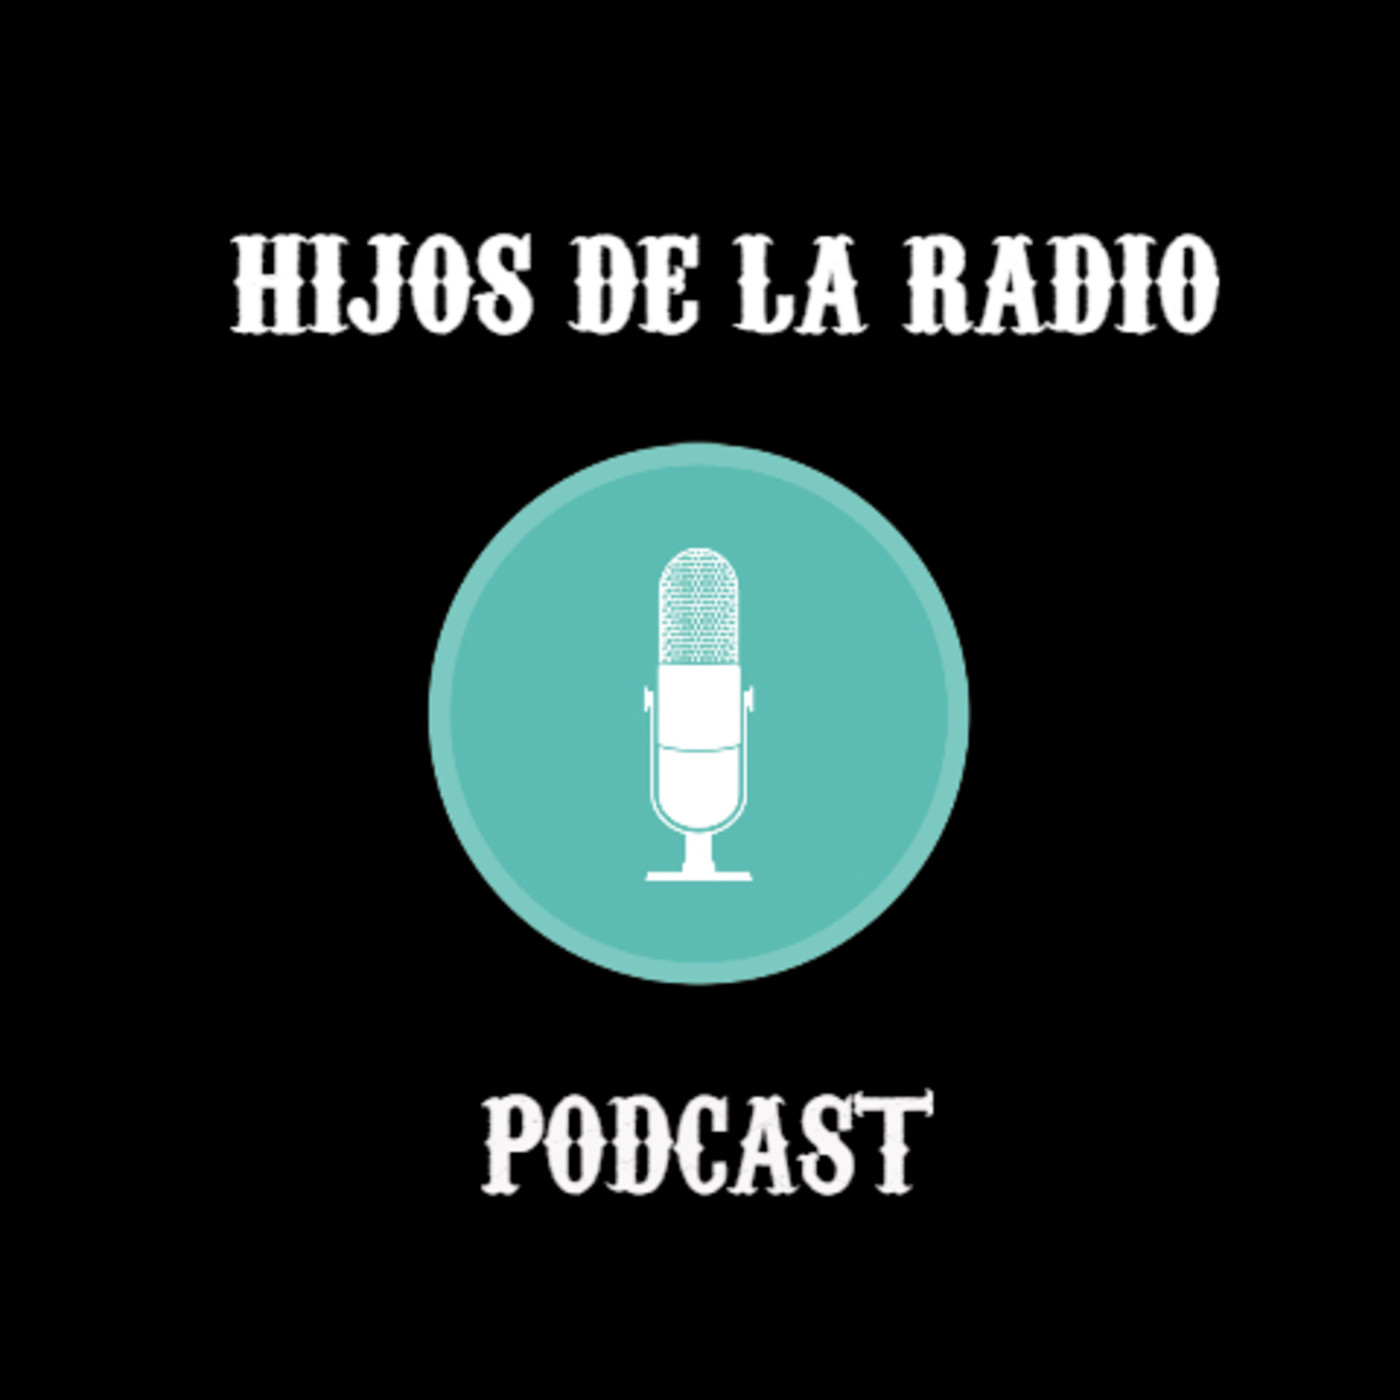 Hijos de la radio